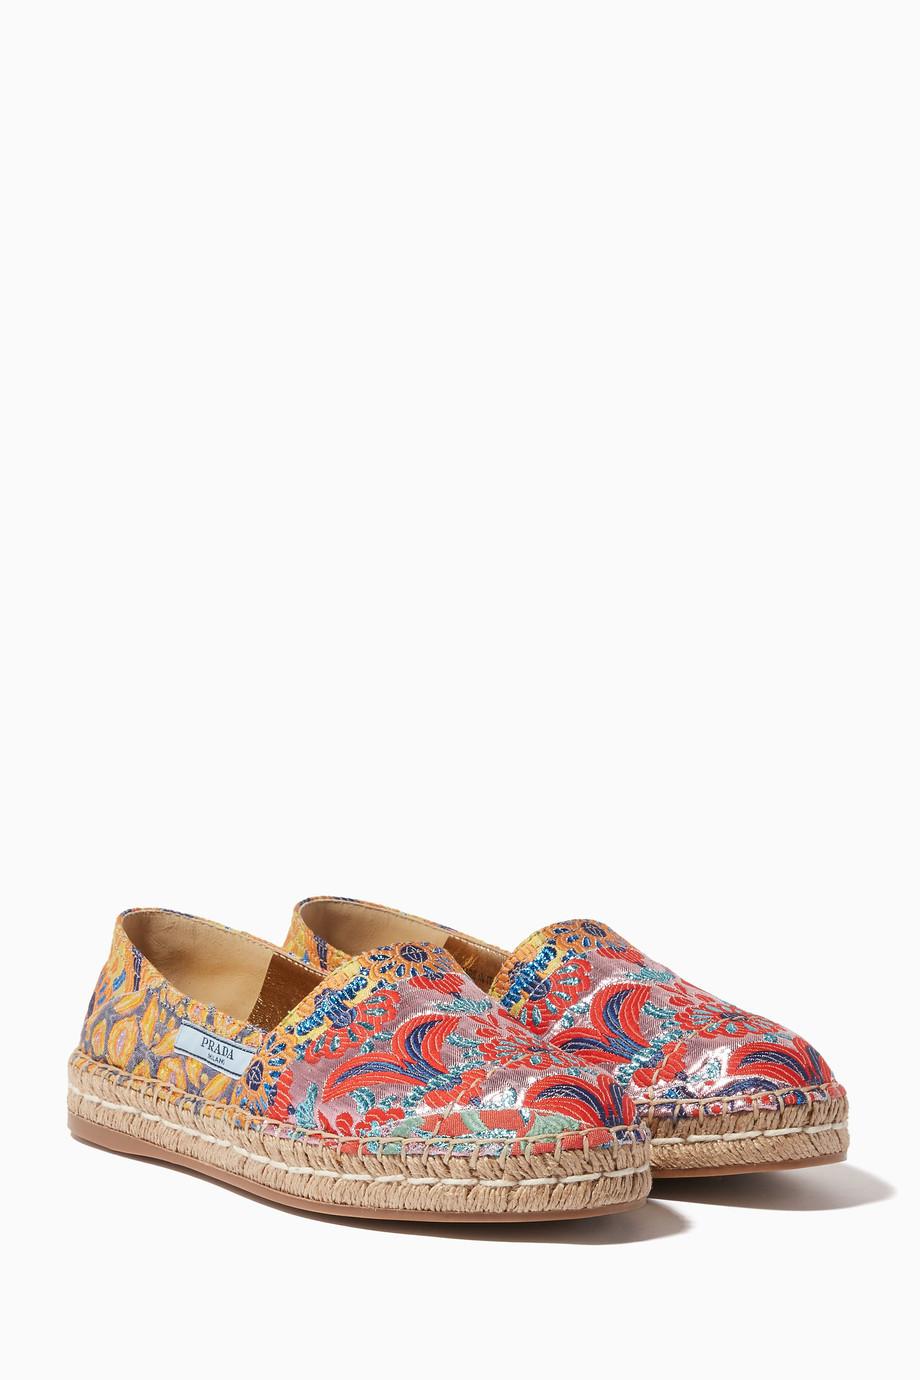 de57239ee تسوق حذاء سبادريل مطرز متعدد الألوان من الجاكارد المنقوش Prada ملون ...